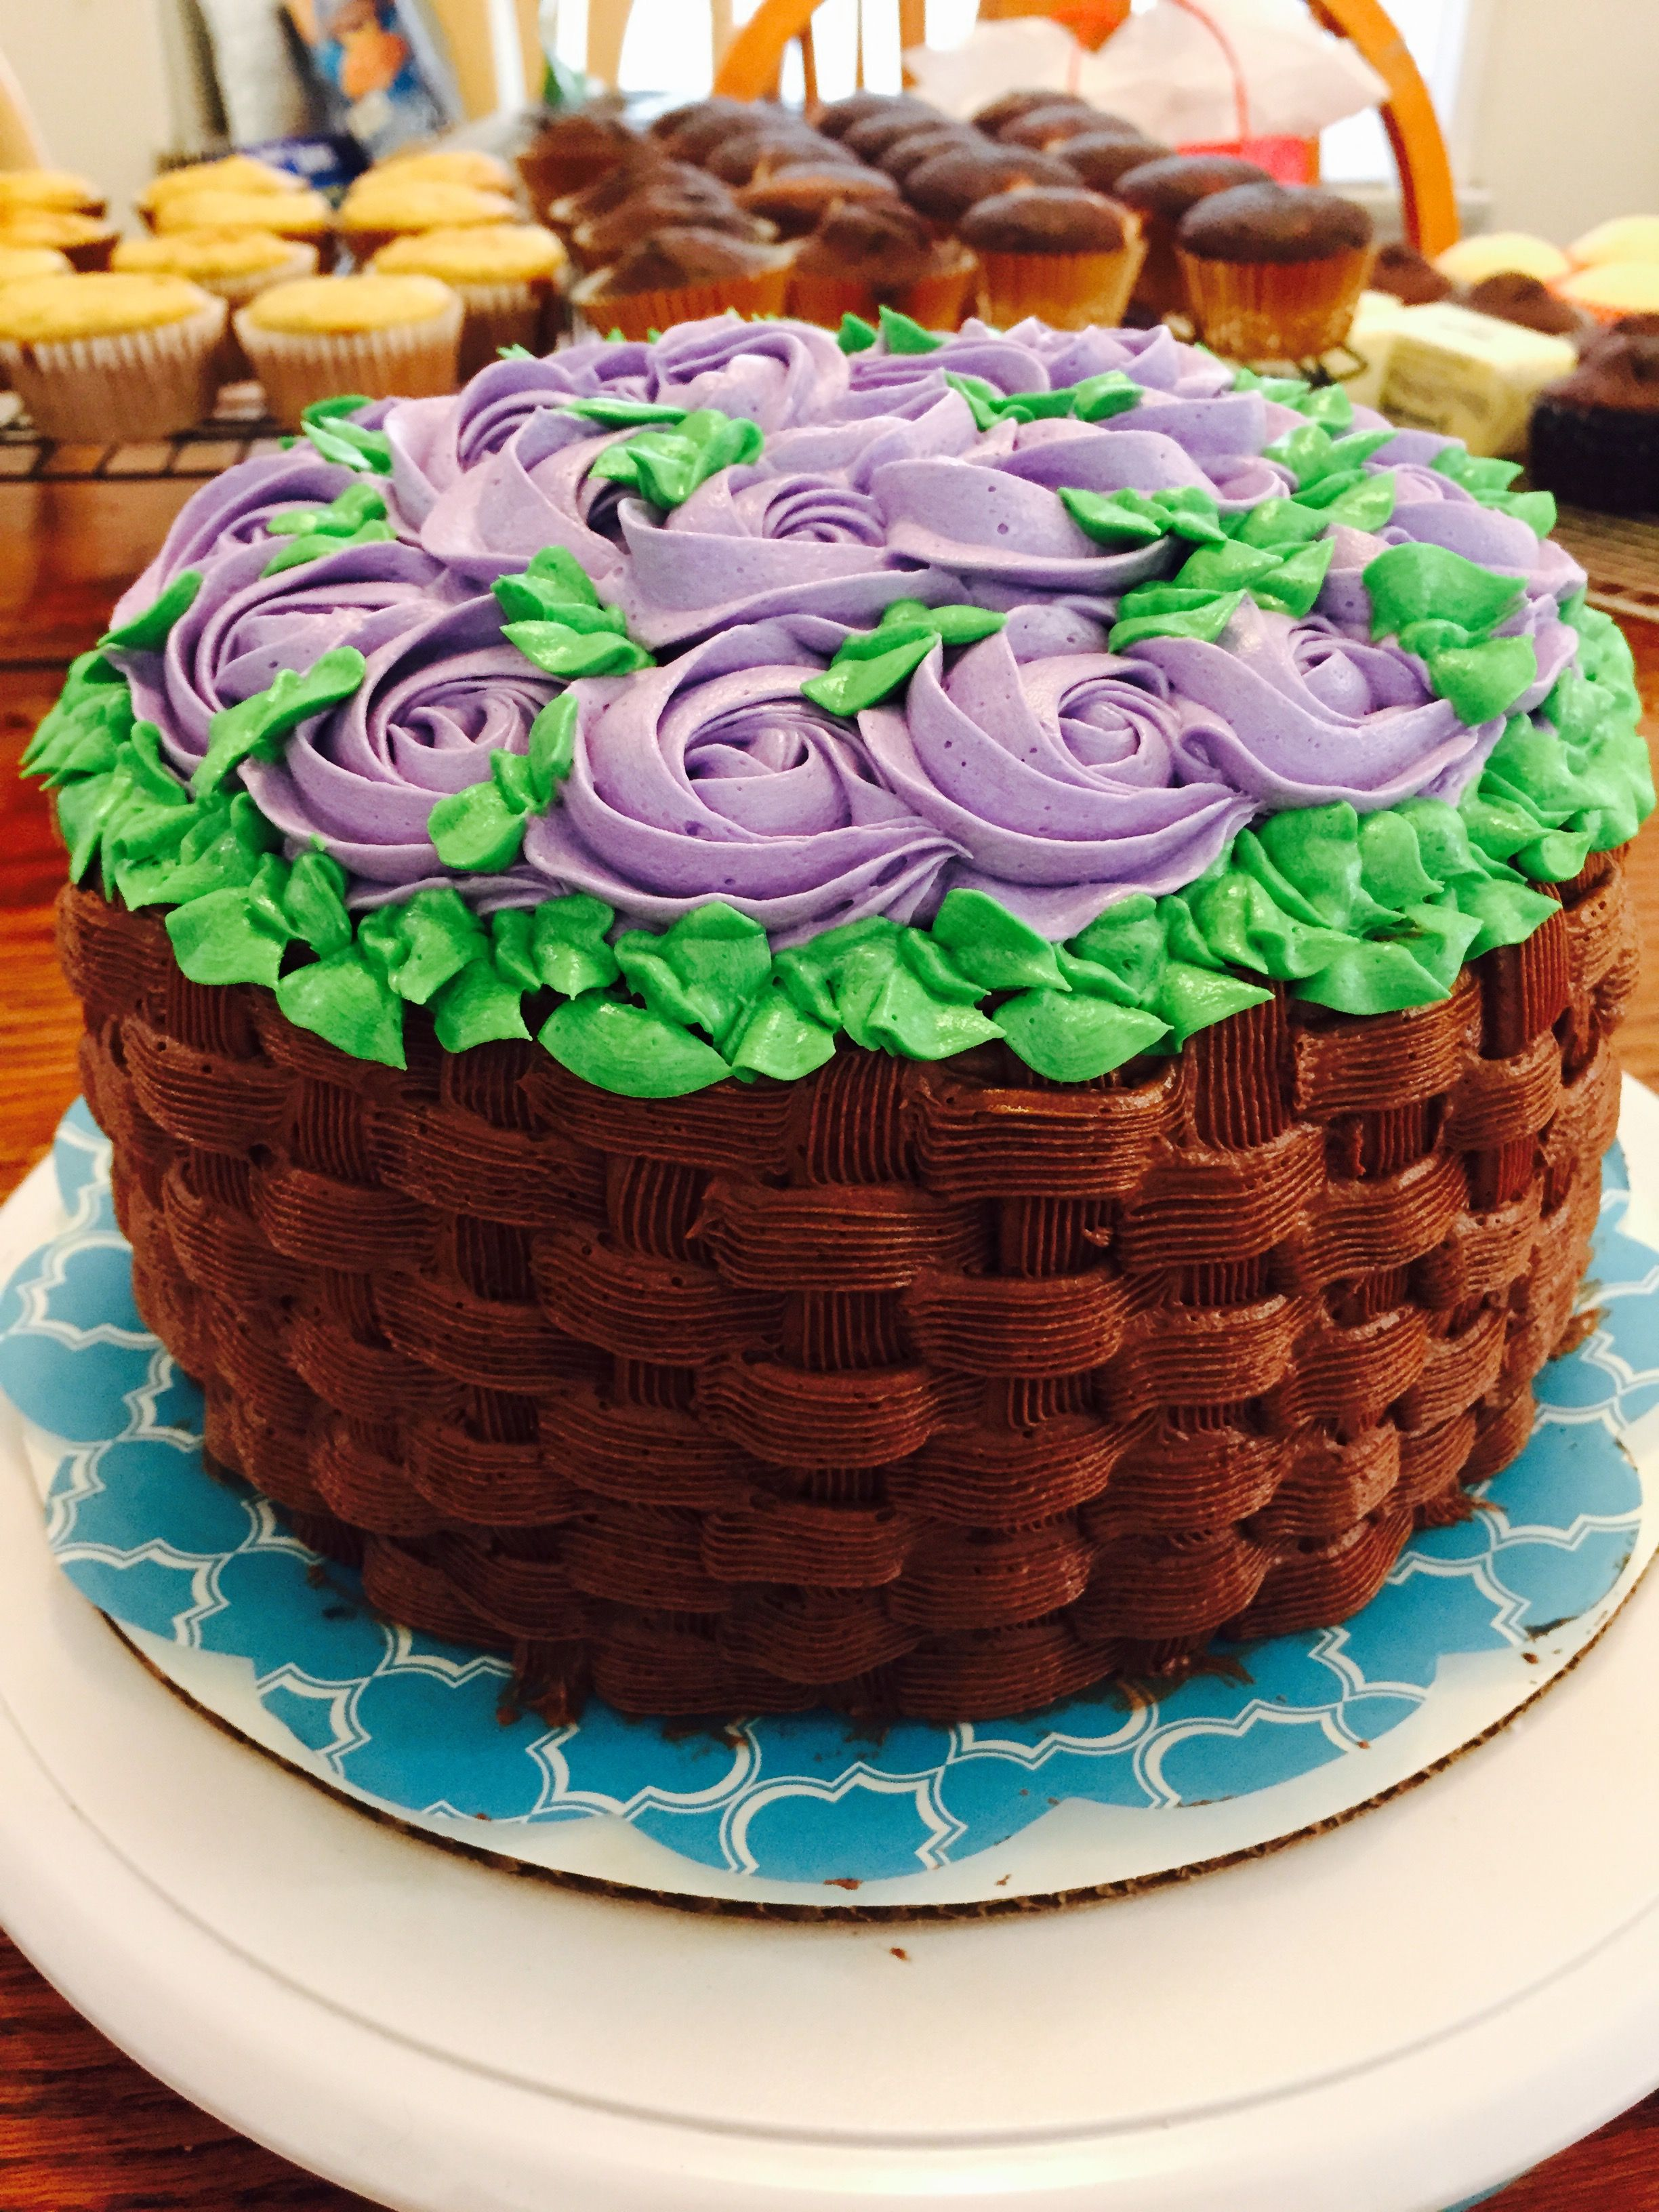 Basket Weaving A Cake : Basket weave rosette cake